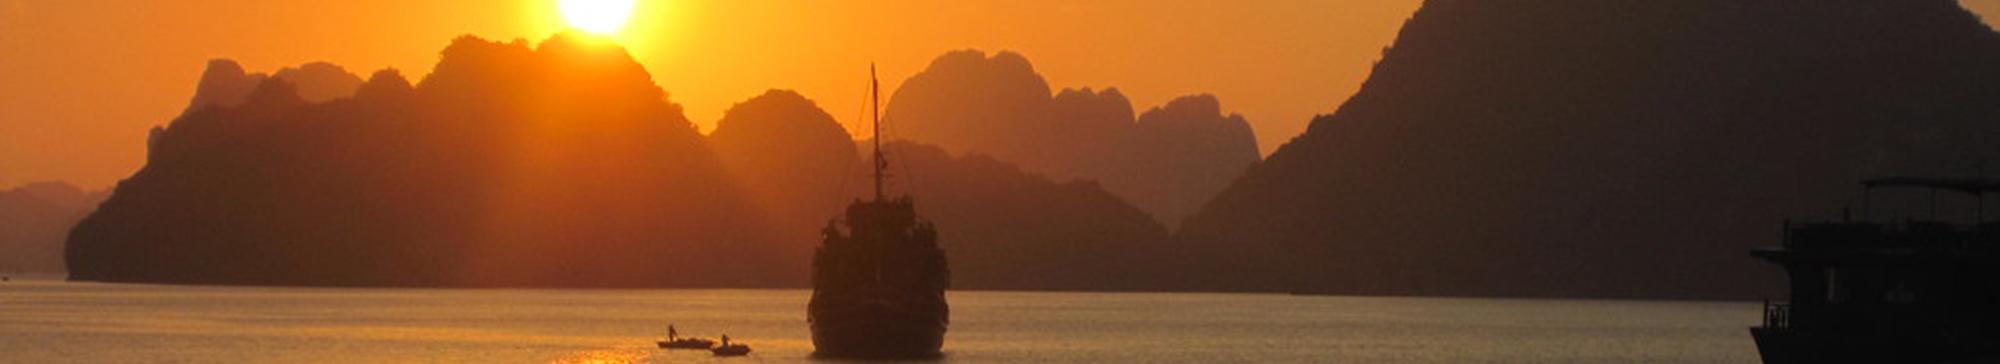 Вьетнамское приключение:<br>Ханой, Чанг Ан, Ниньбинь, Лао Кай, И Линь Хо, Таван, Занг Та Чай, Супан, Сапа, Ханой, Халонг, Ханой